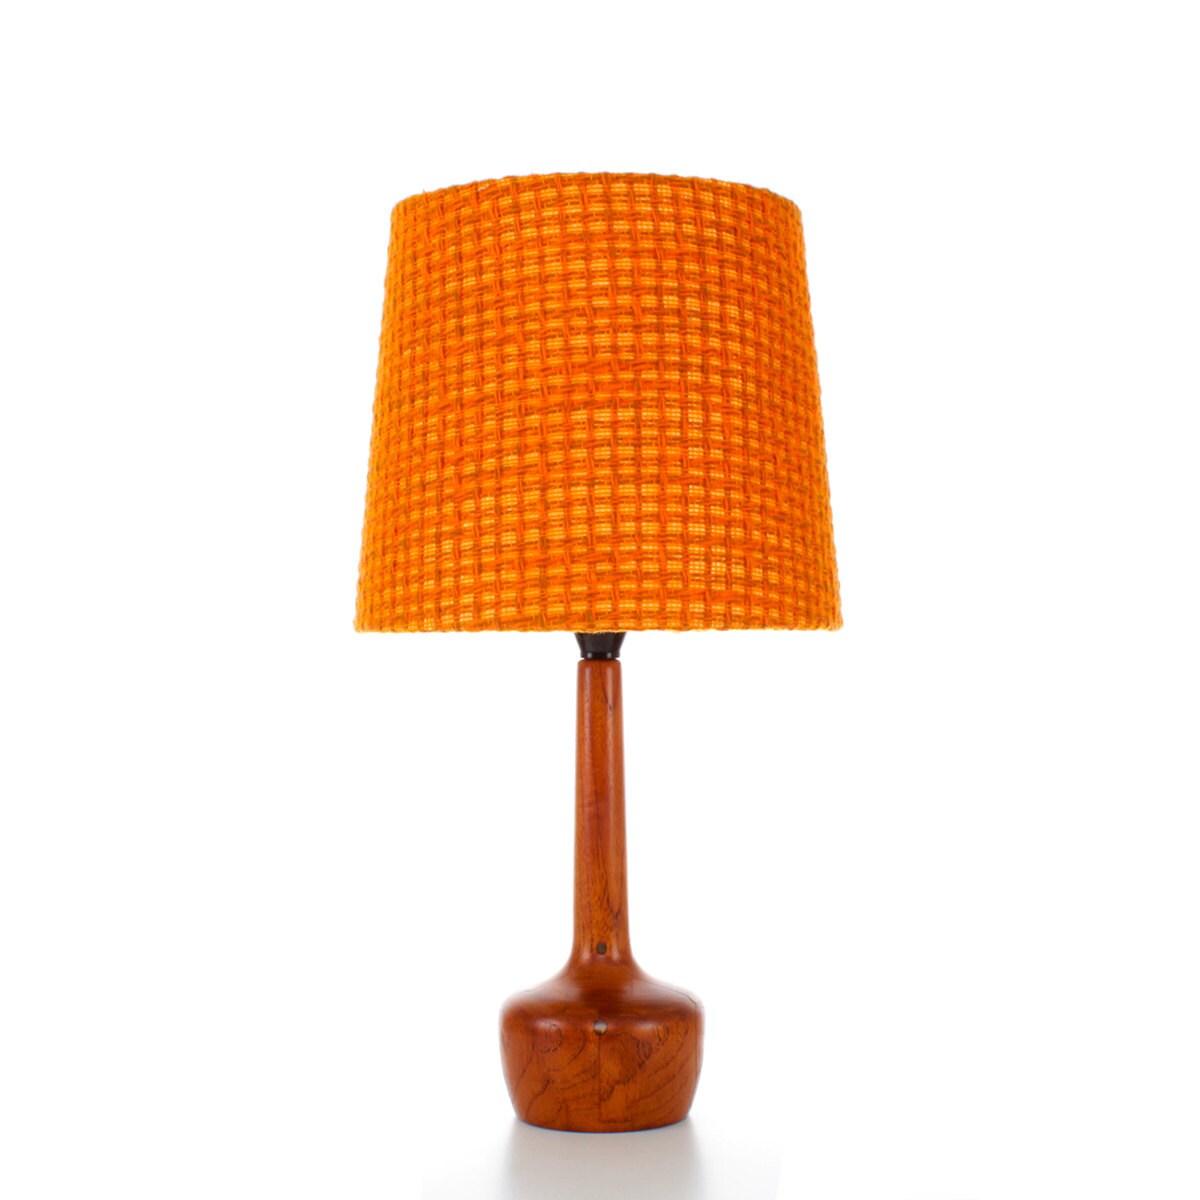 Teak Table Lamp With Orange Shade 1960s Danish Mid Century